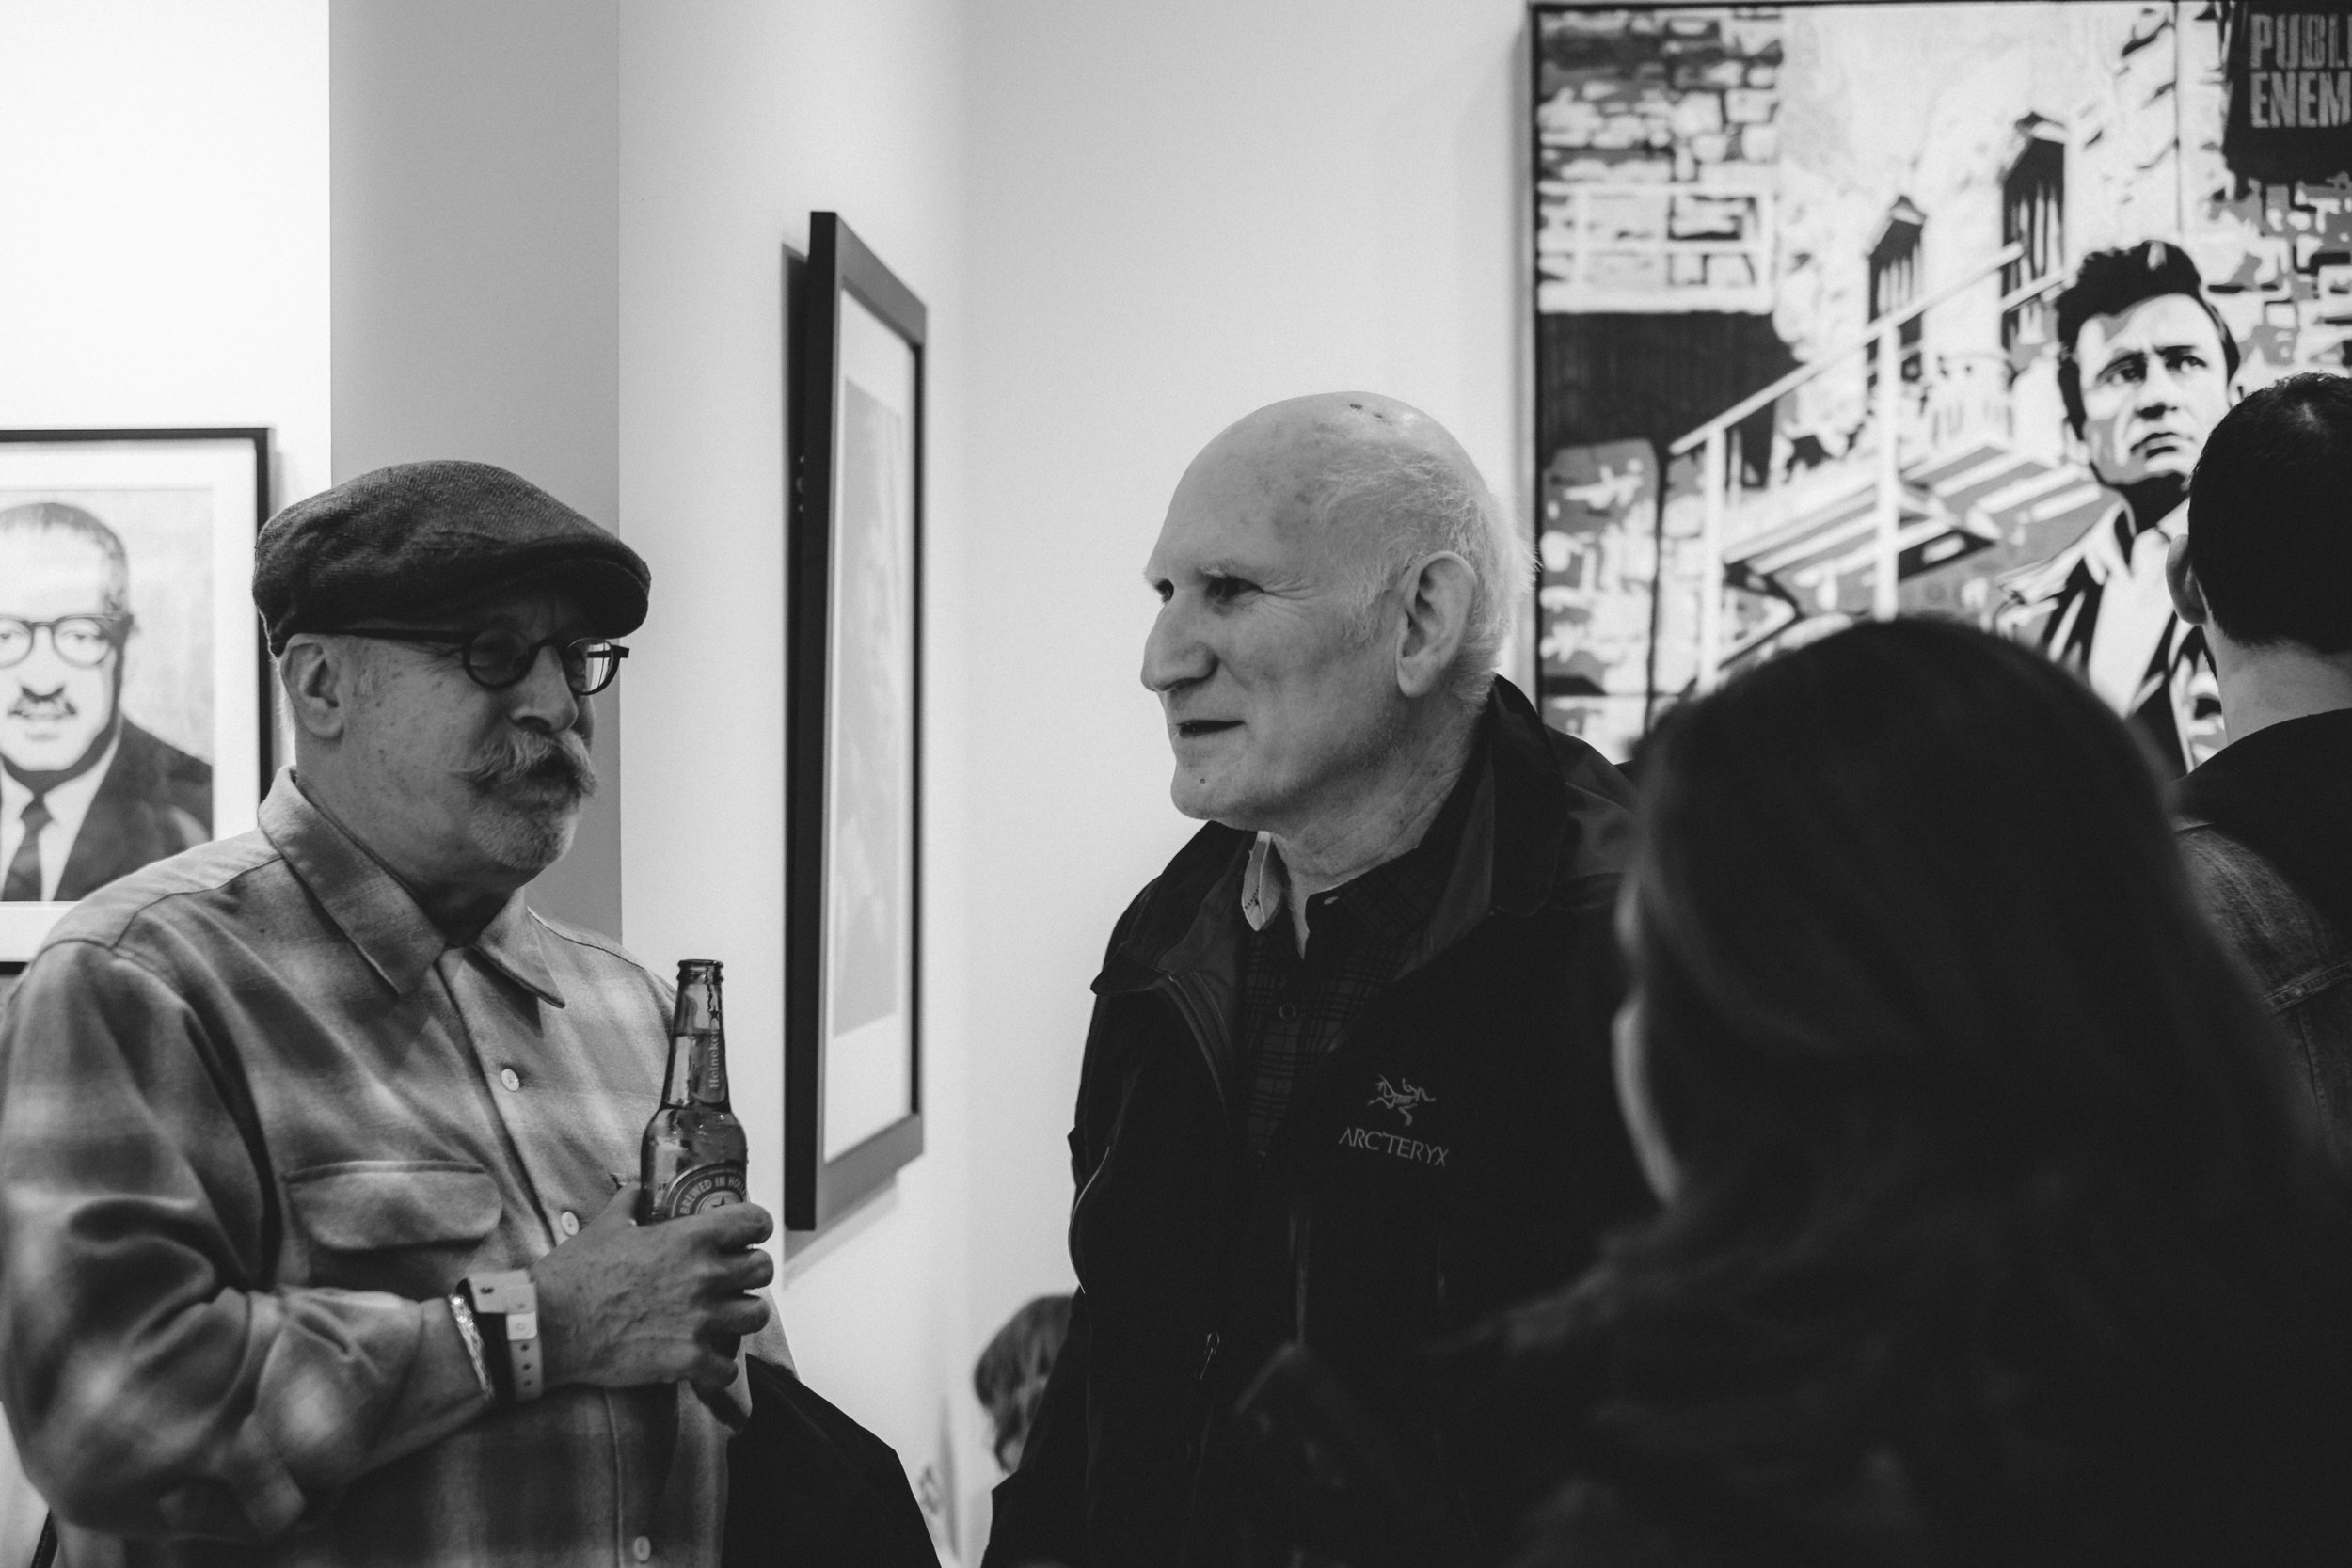 Michael Powers creator of American Civics. Peter Frank; art critic and associate editor of Fabrik Magazine.